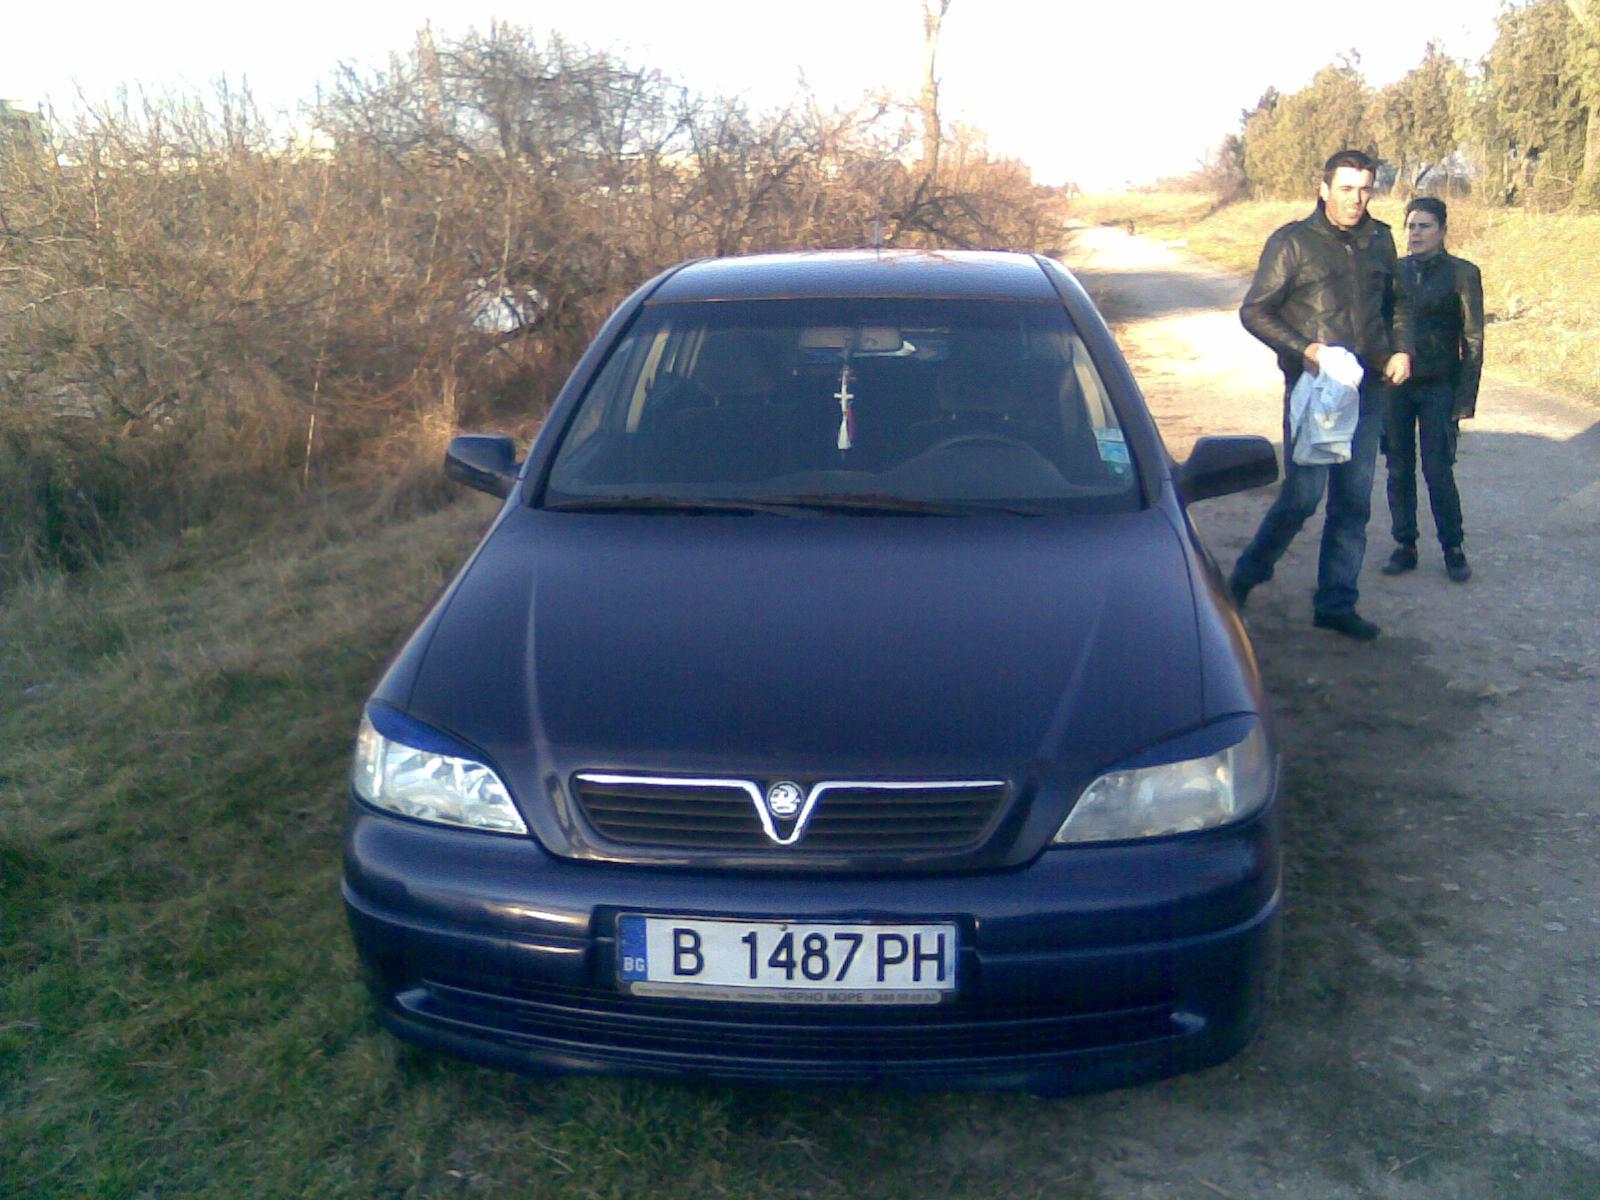 Opel Astra-G avariat 2000 Diesel Hatchback - 18 Februarie 2011 - Poza 4